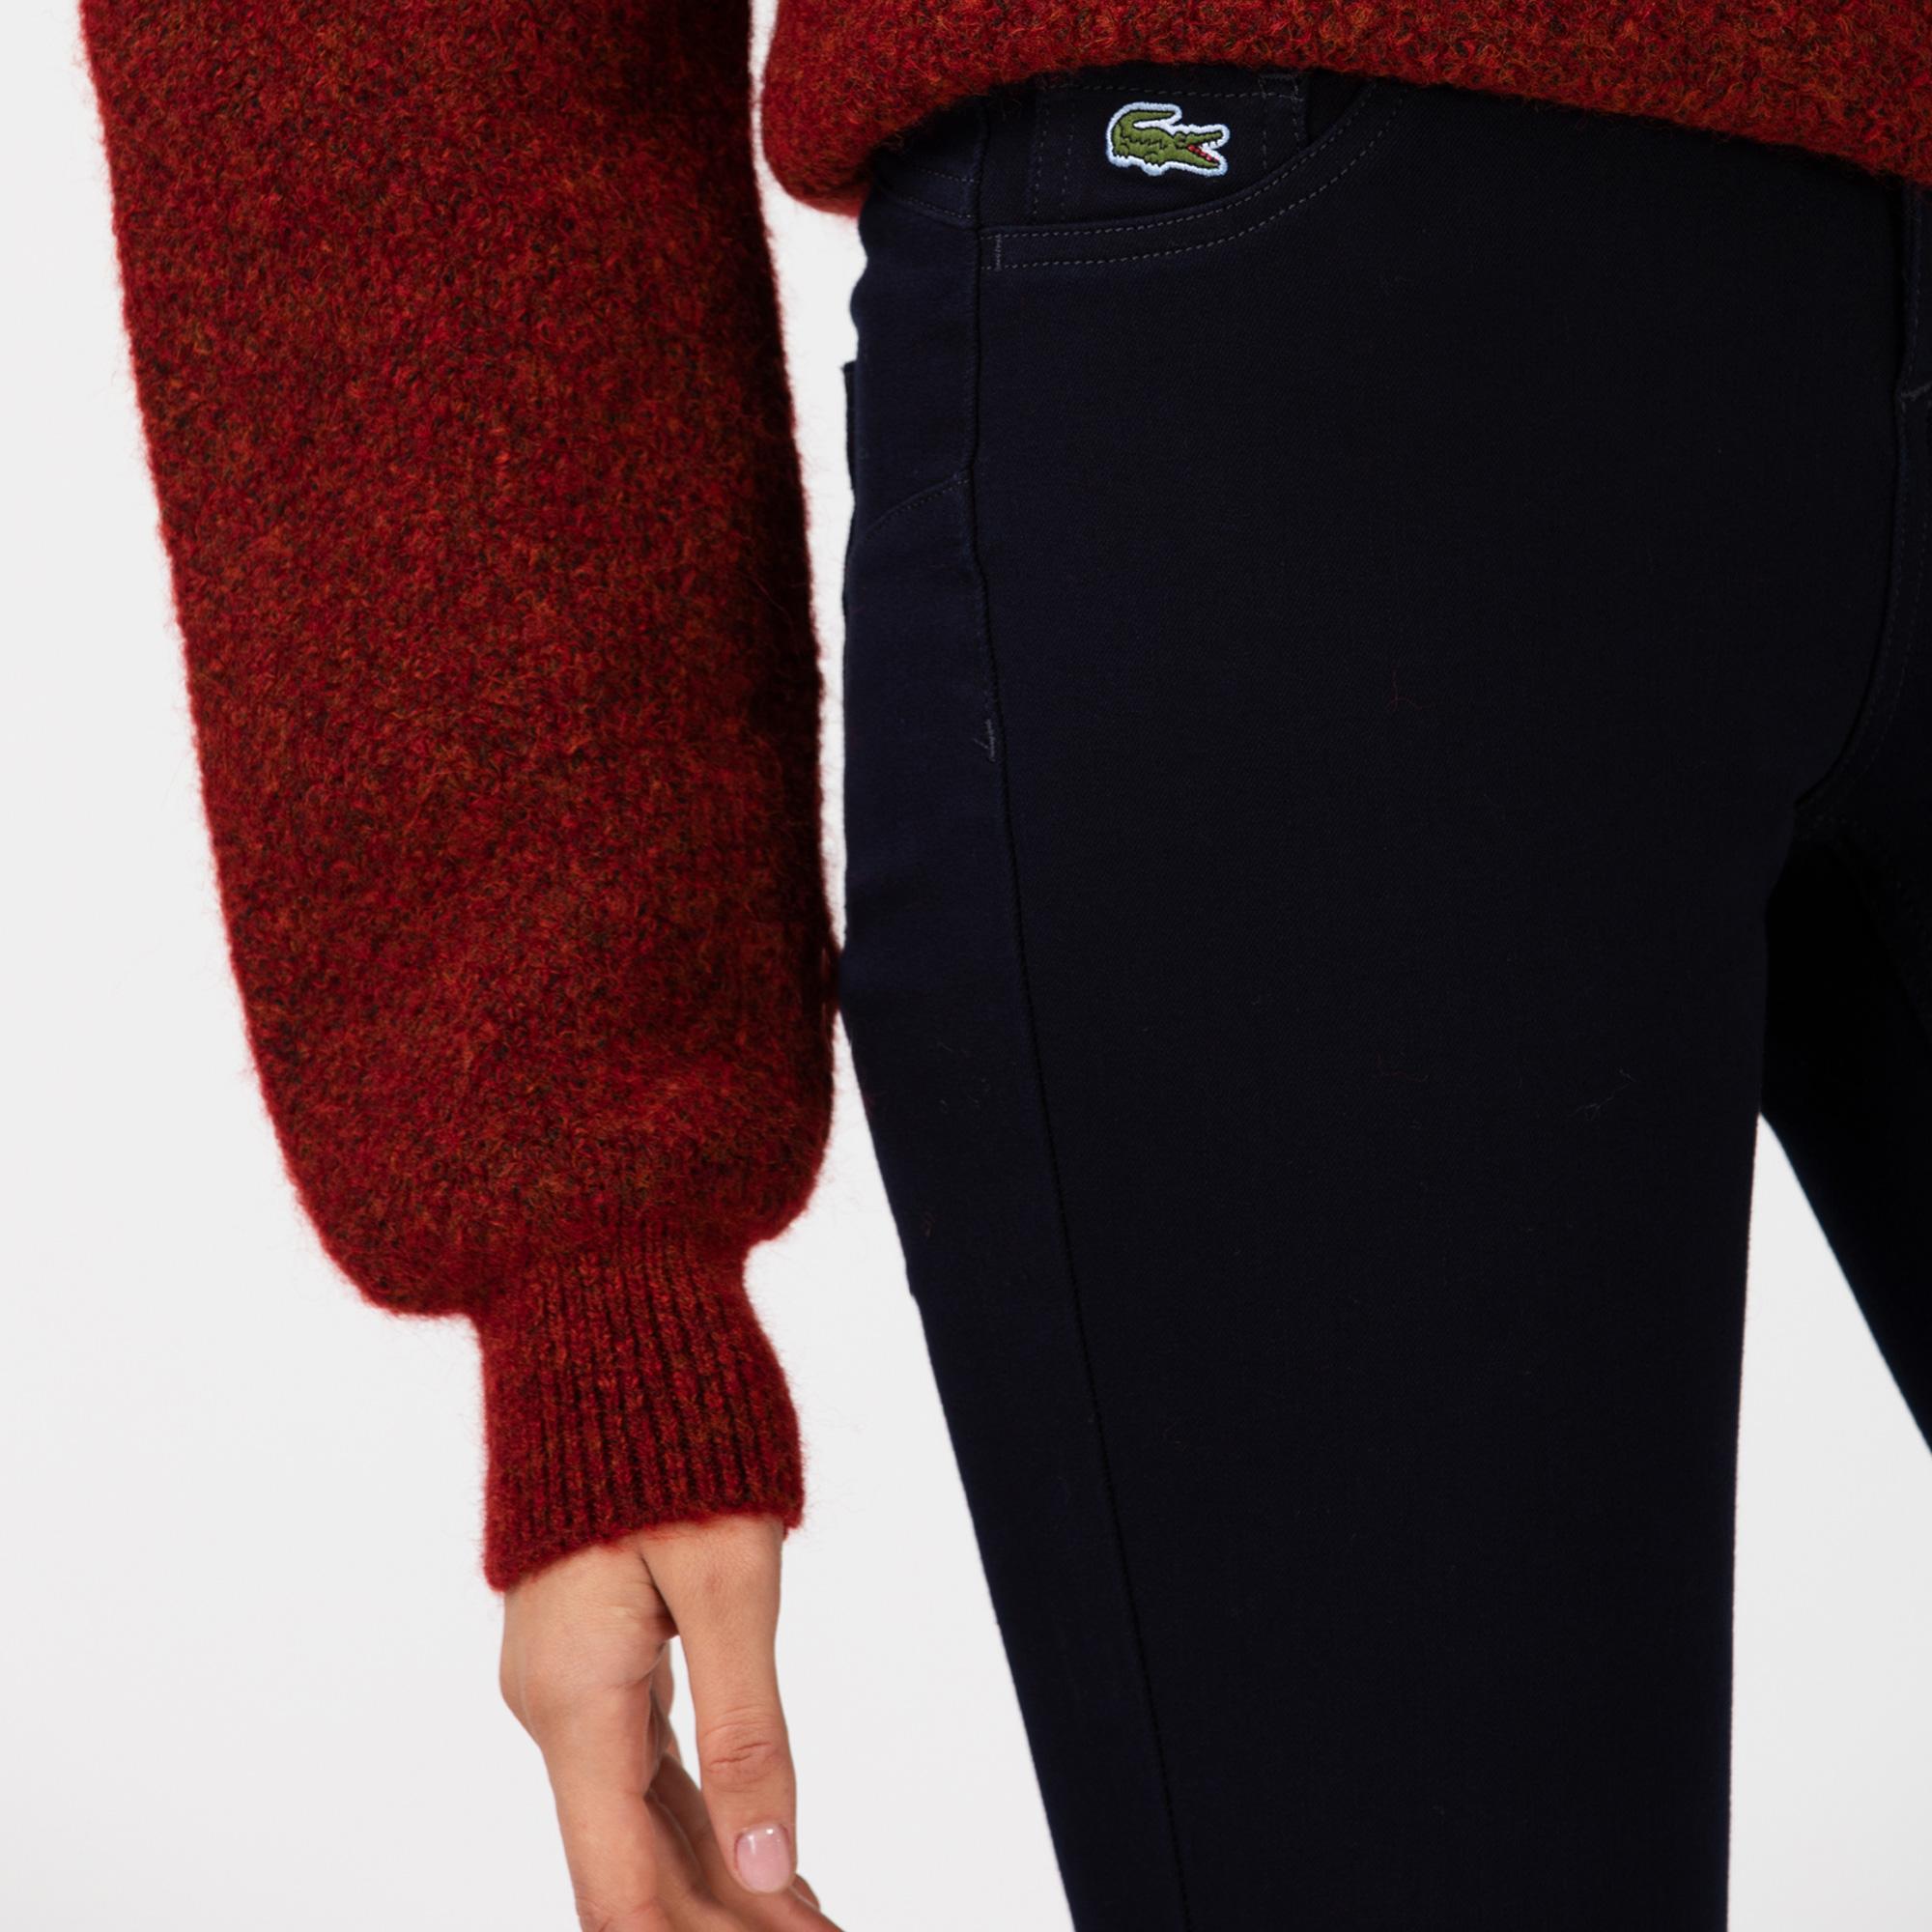 Lacoste Spodnie Damskie Slim Fit